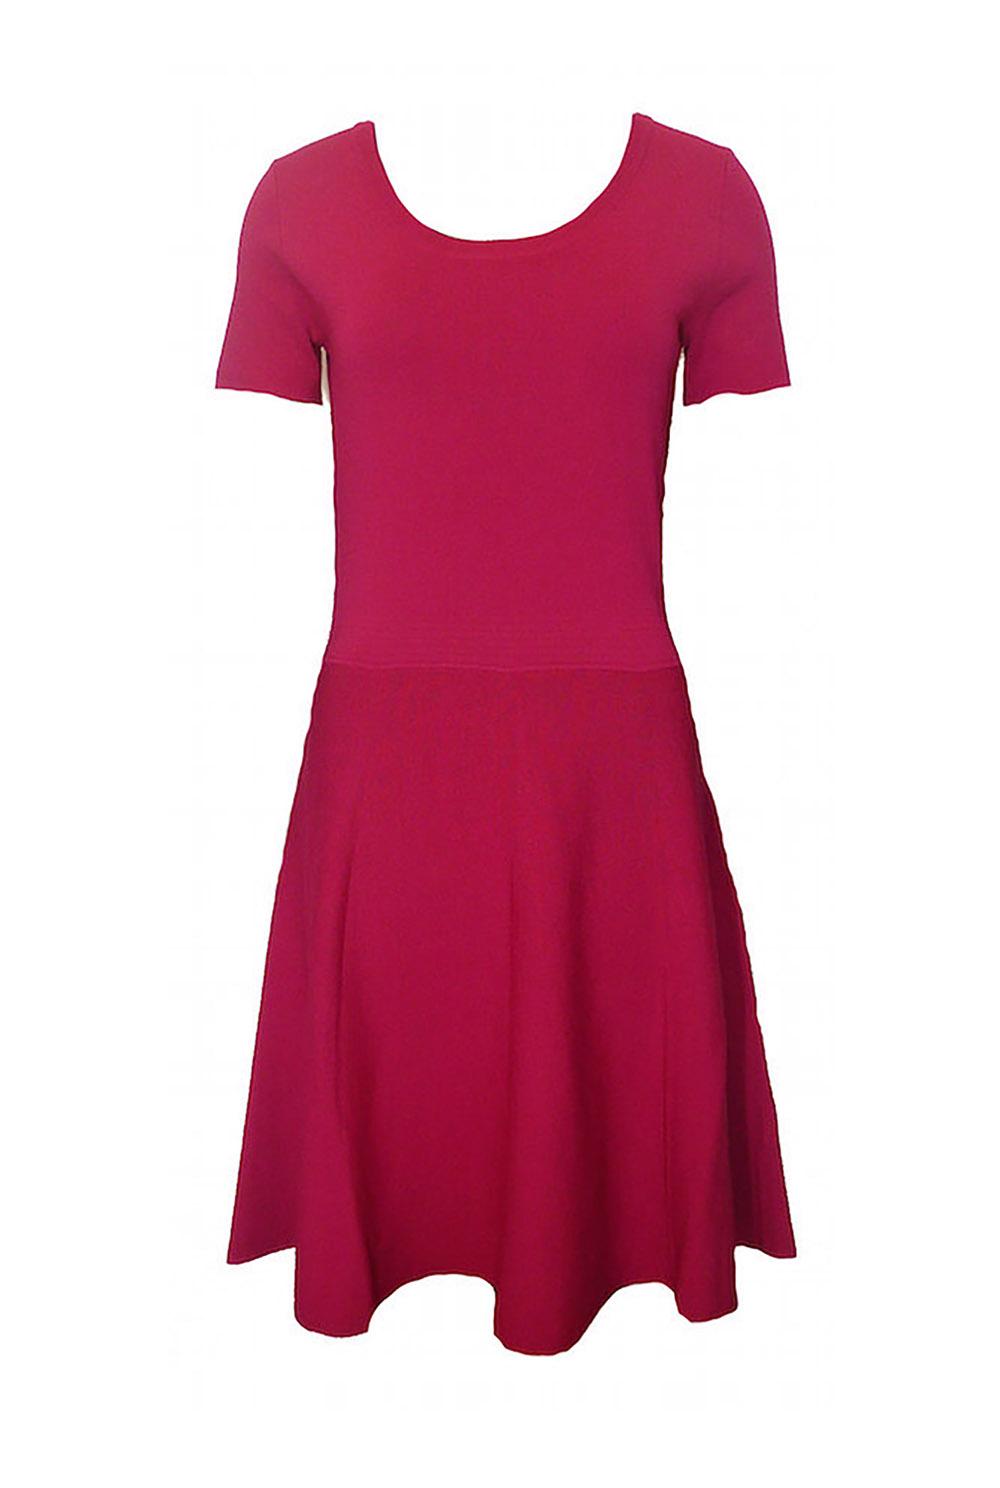 dress fit flare magenta knt.jpg